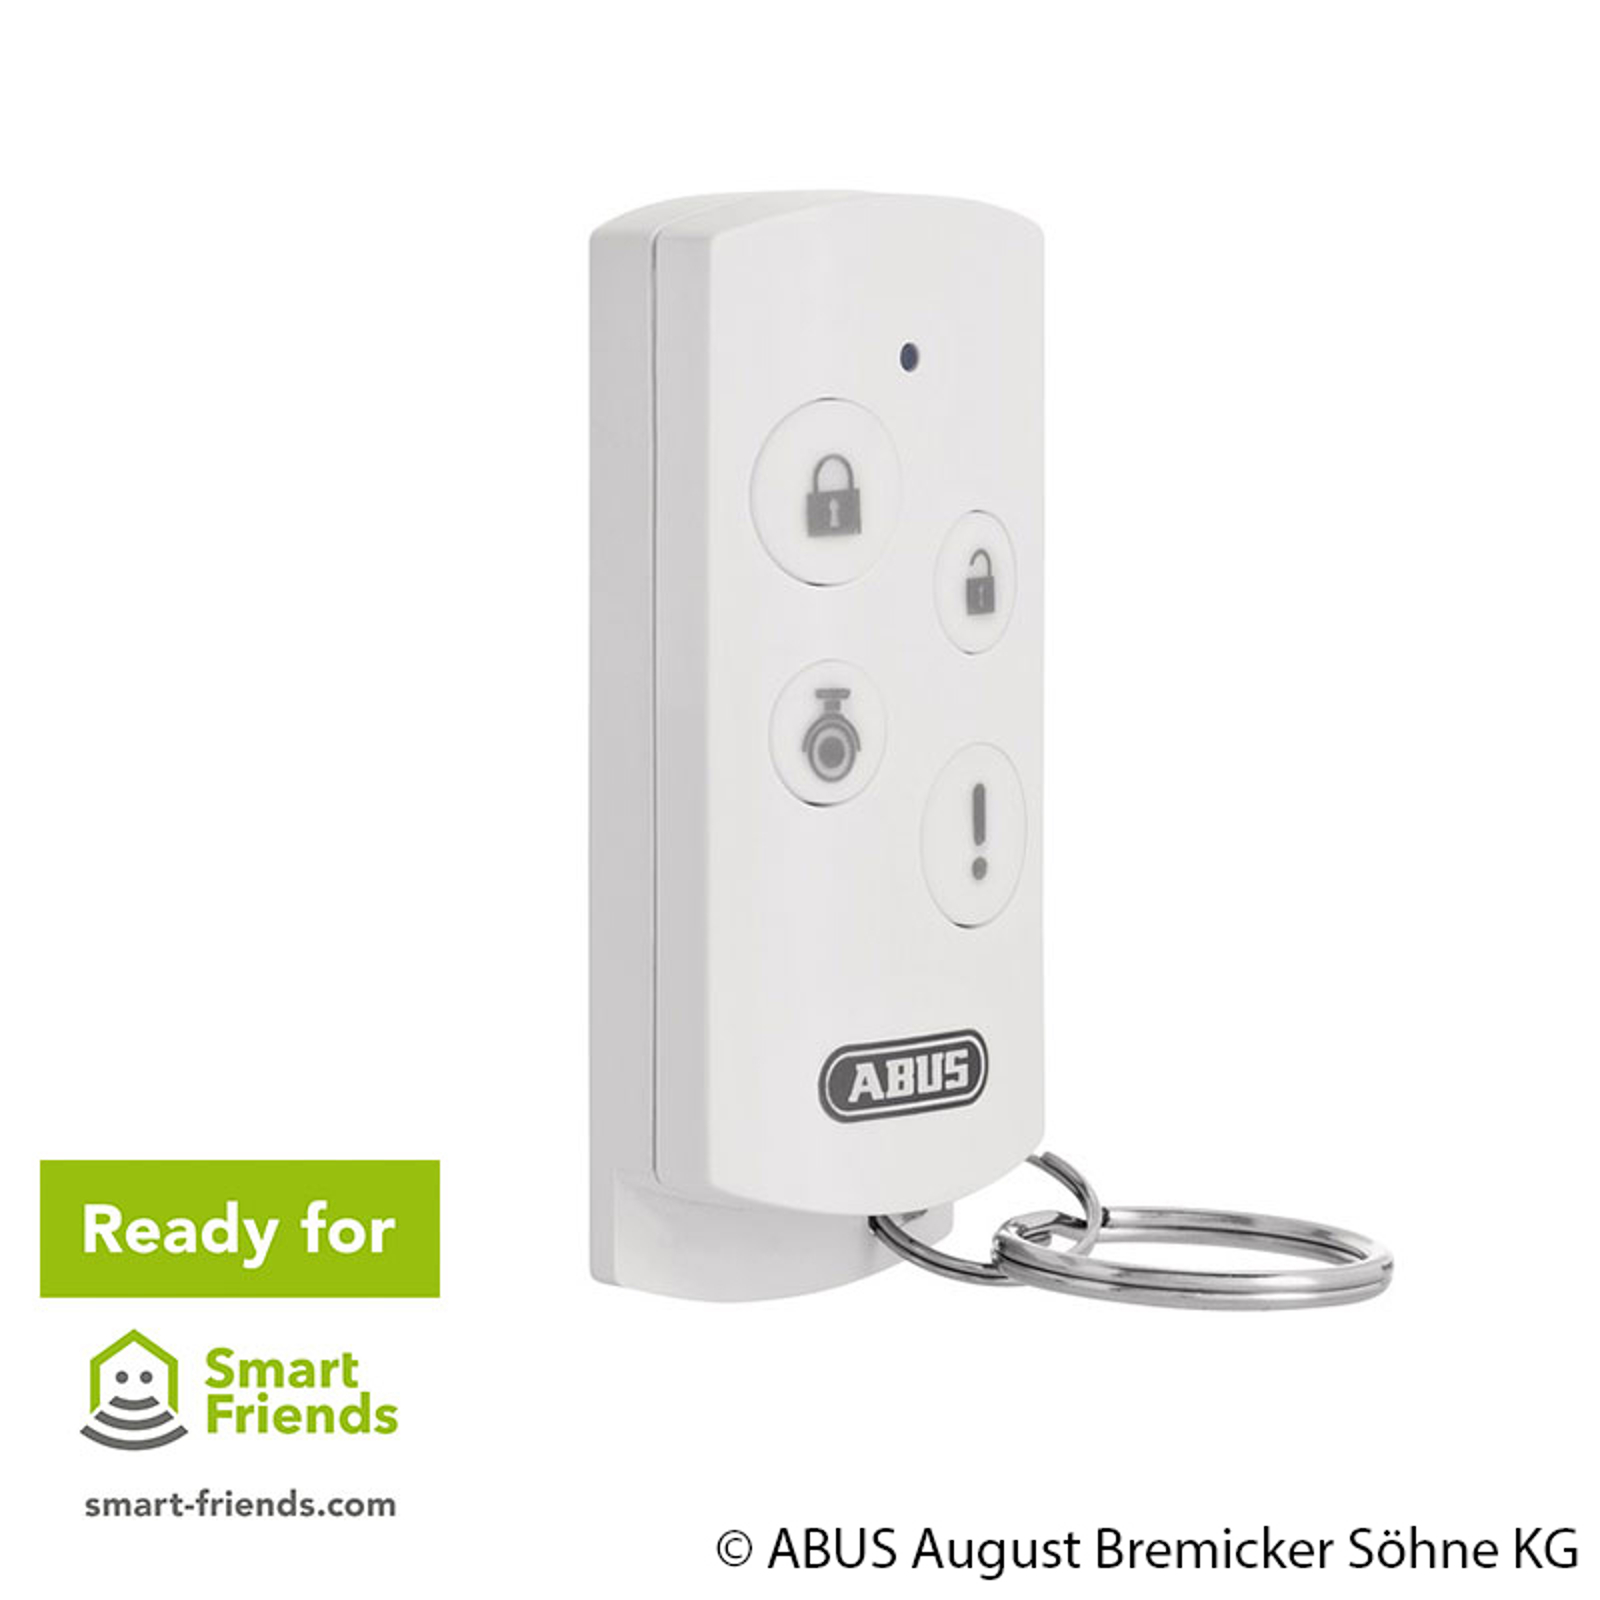 ABUS Smartvest télécommande radio